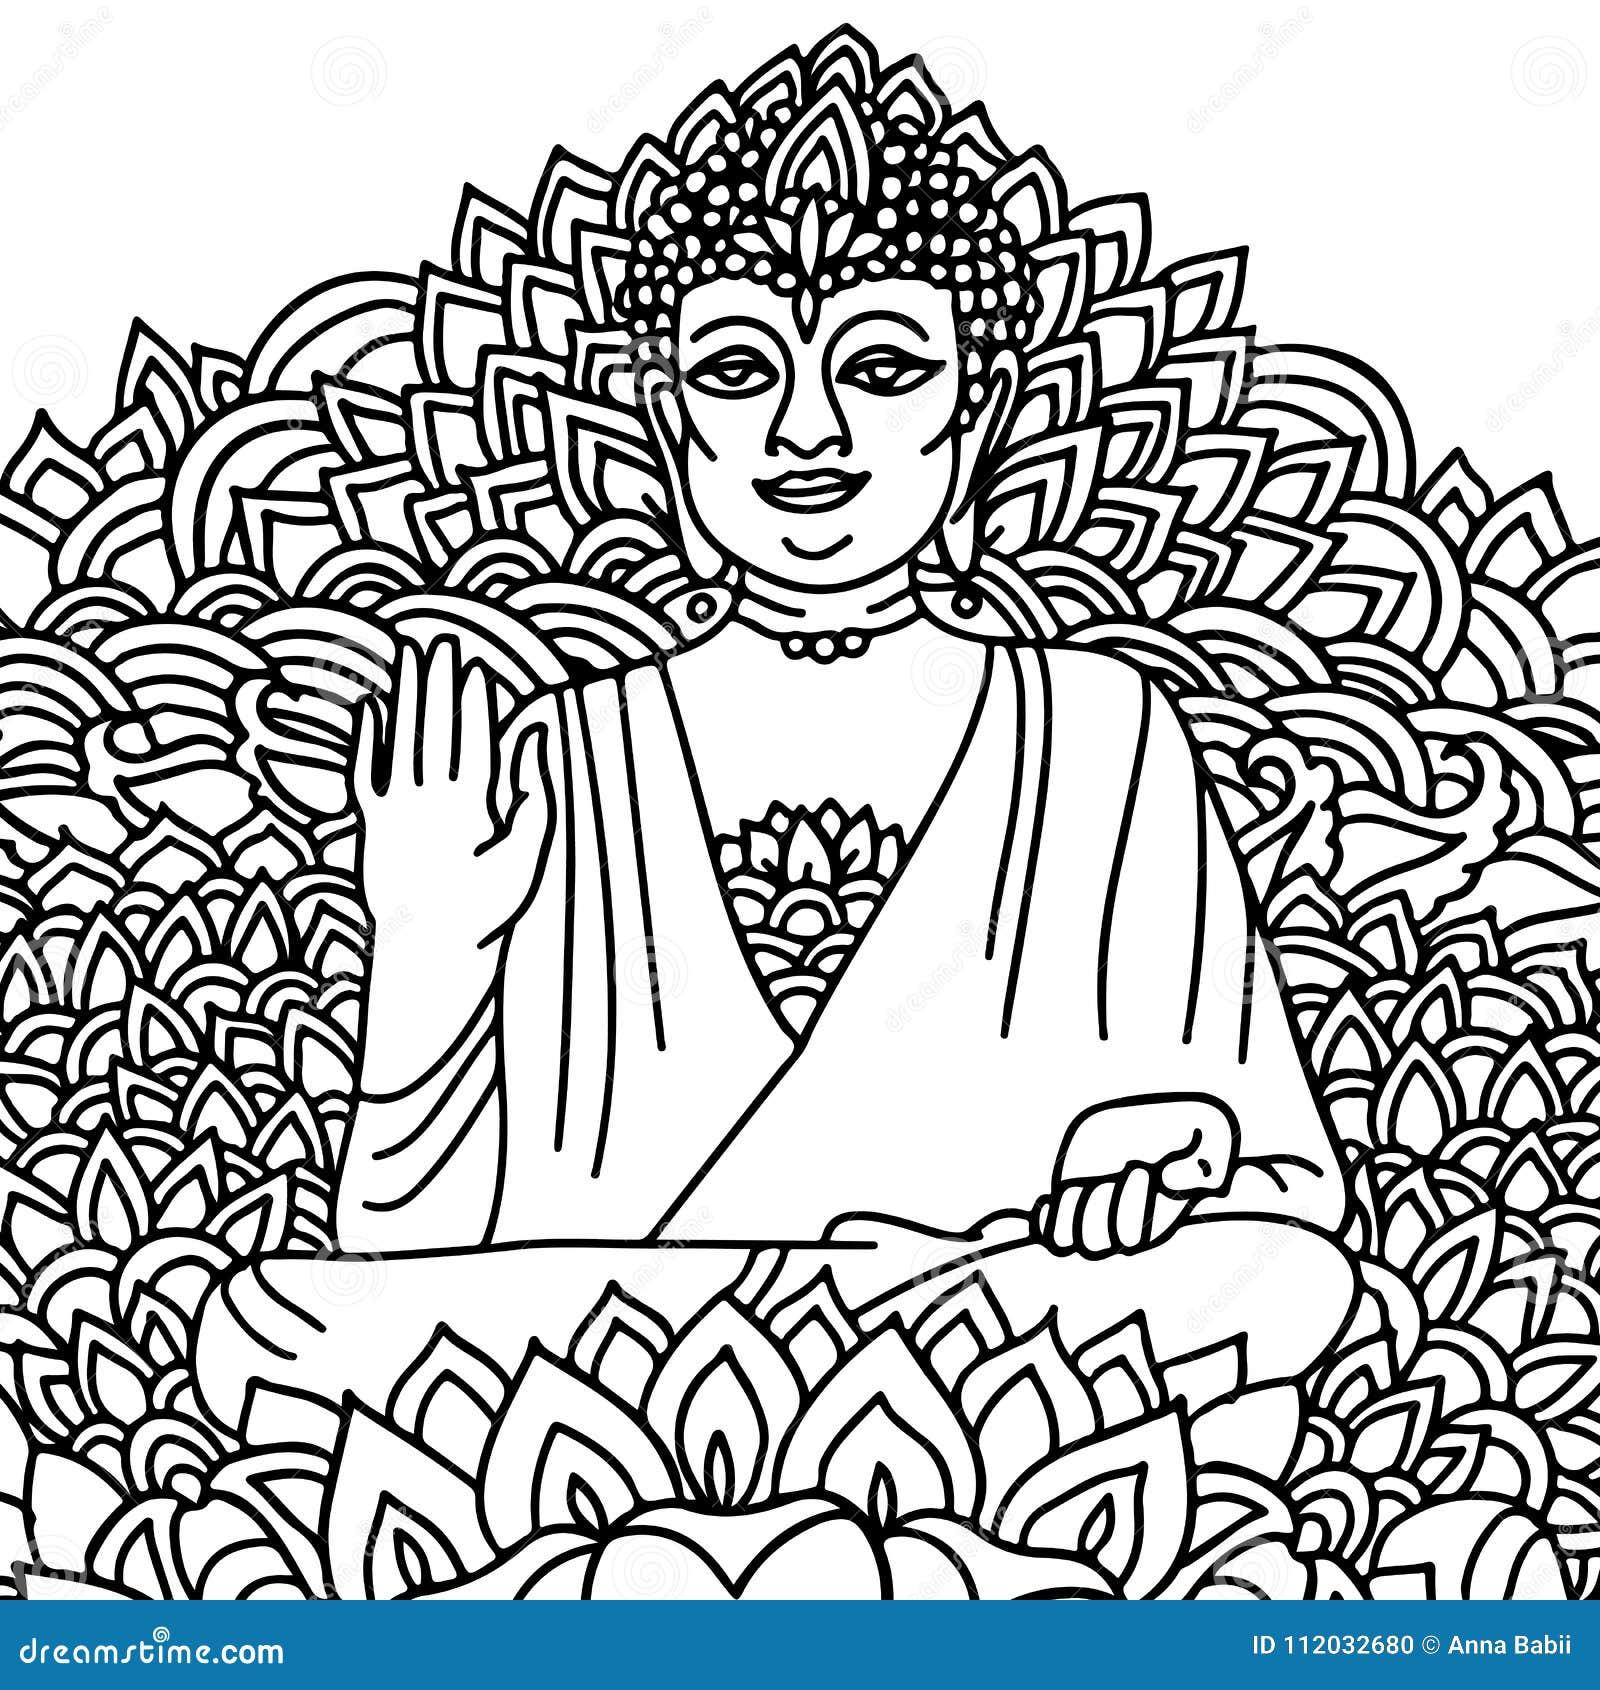 Sitting Buddha In A Lotus Flower Mandala Style Print Vector